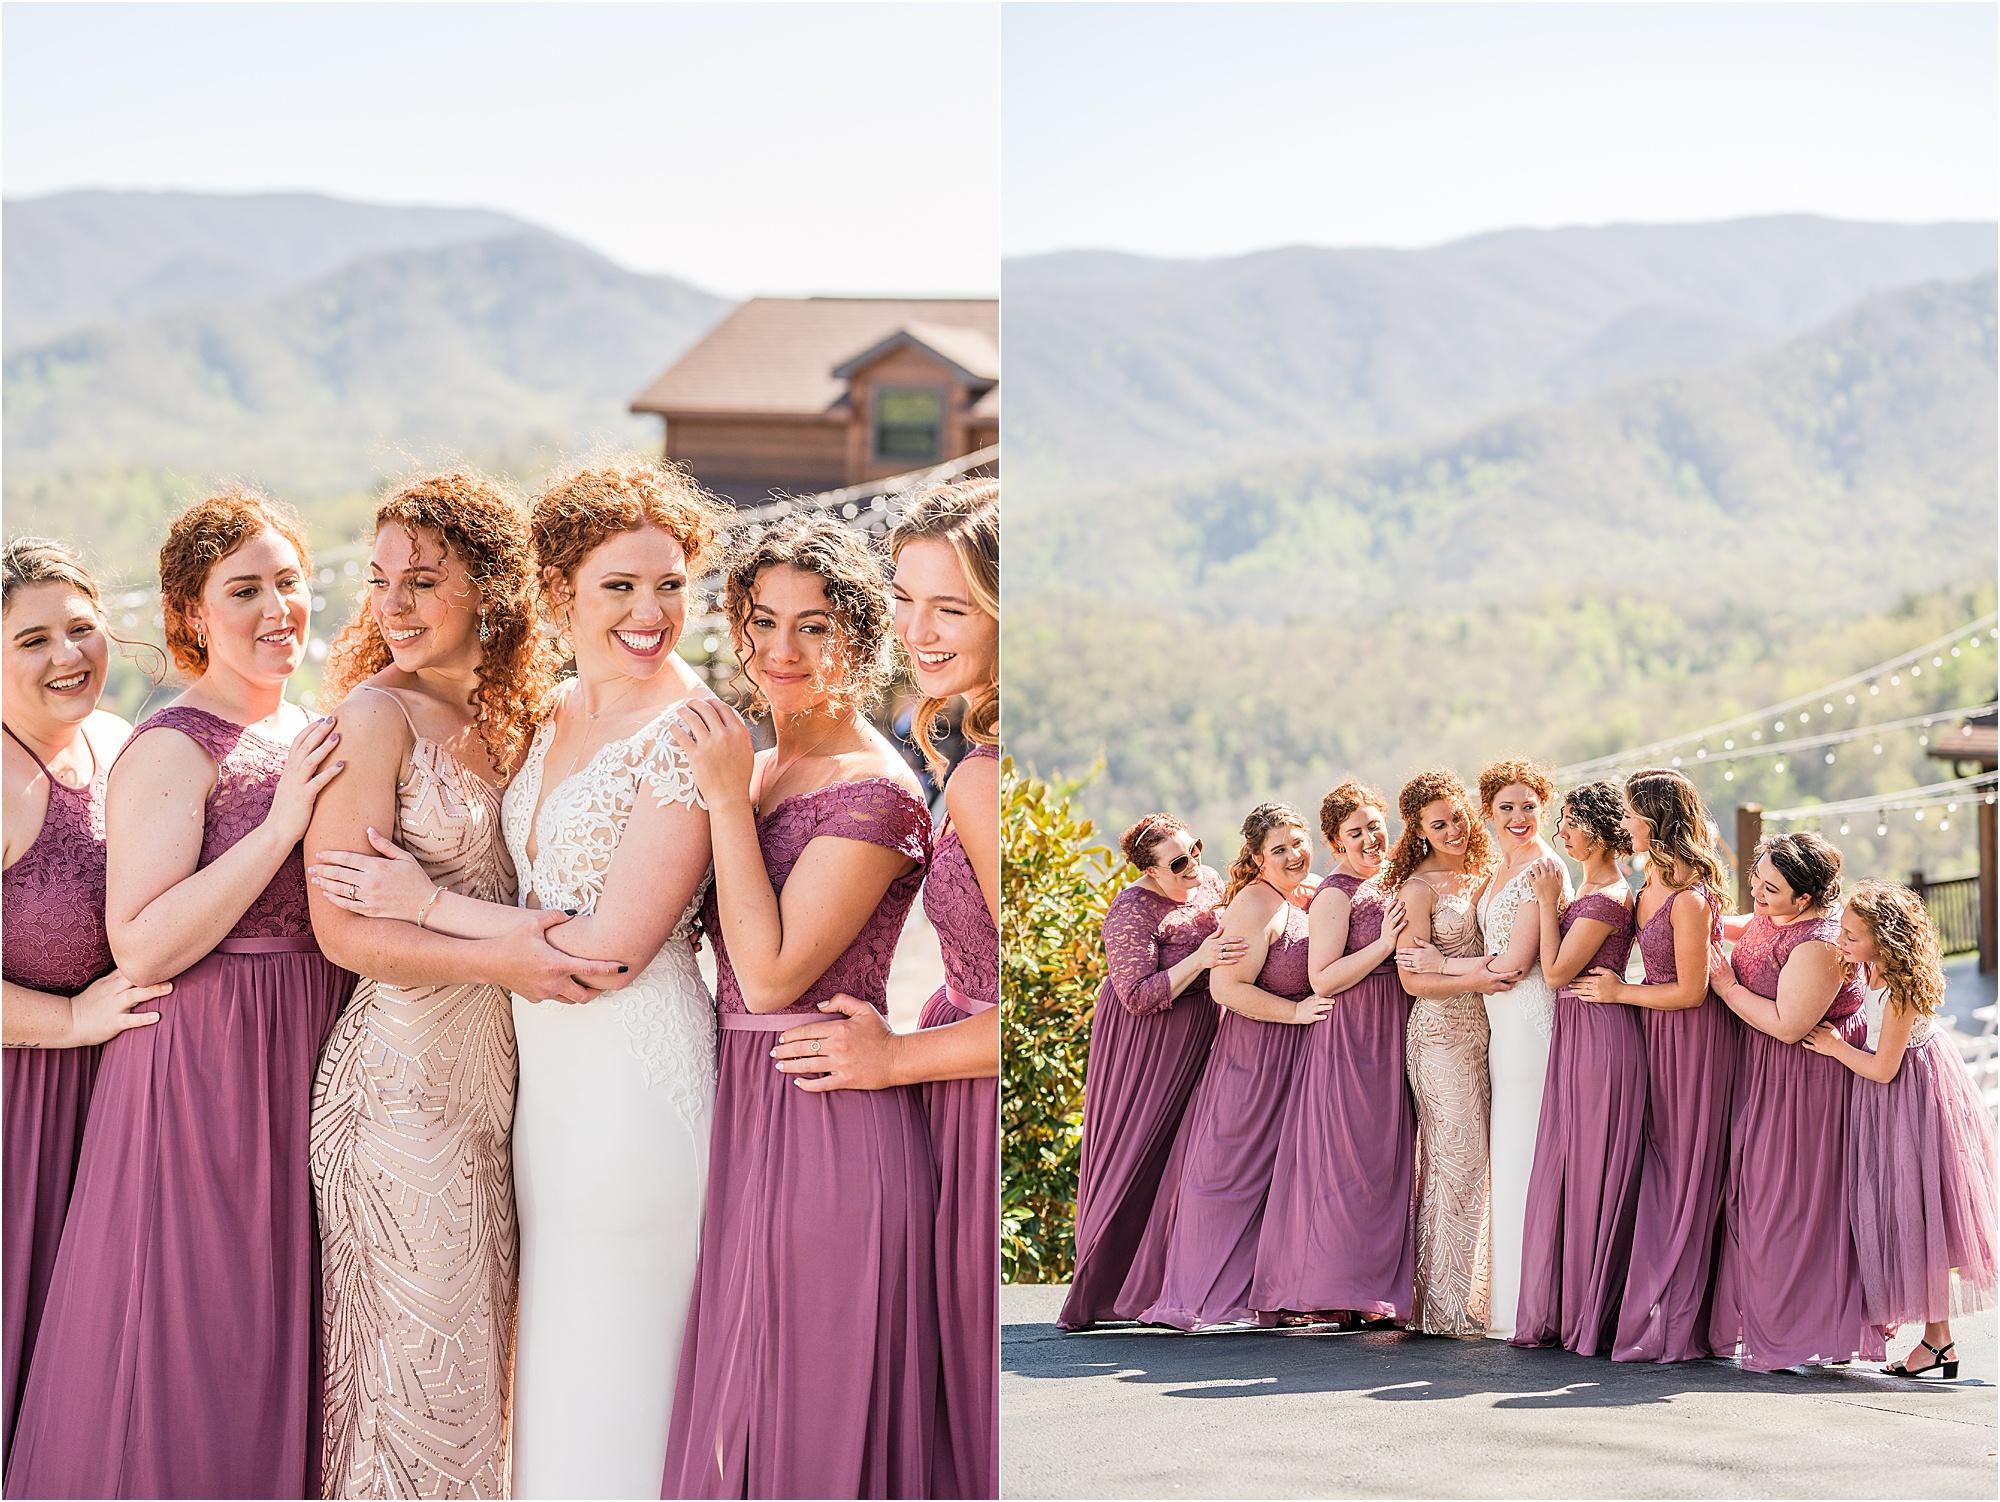 bride and bridesmaid photos in purple dresses